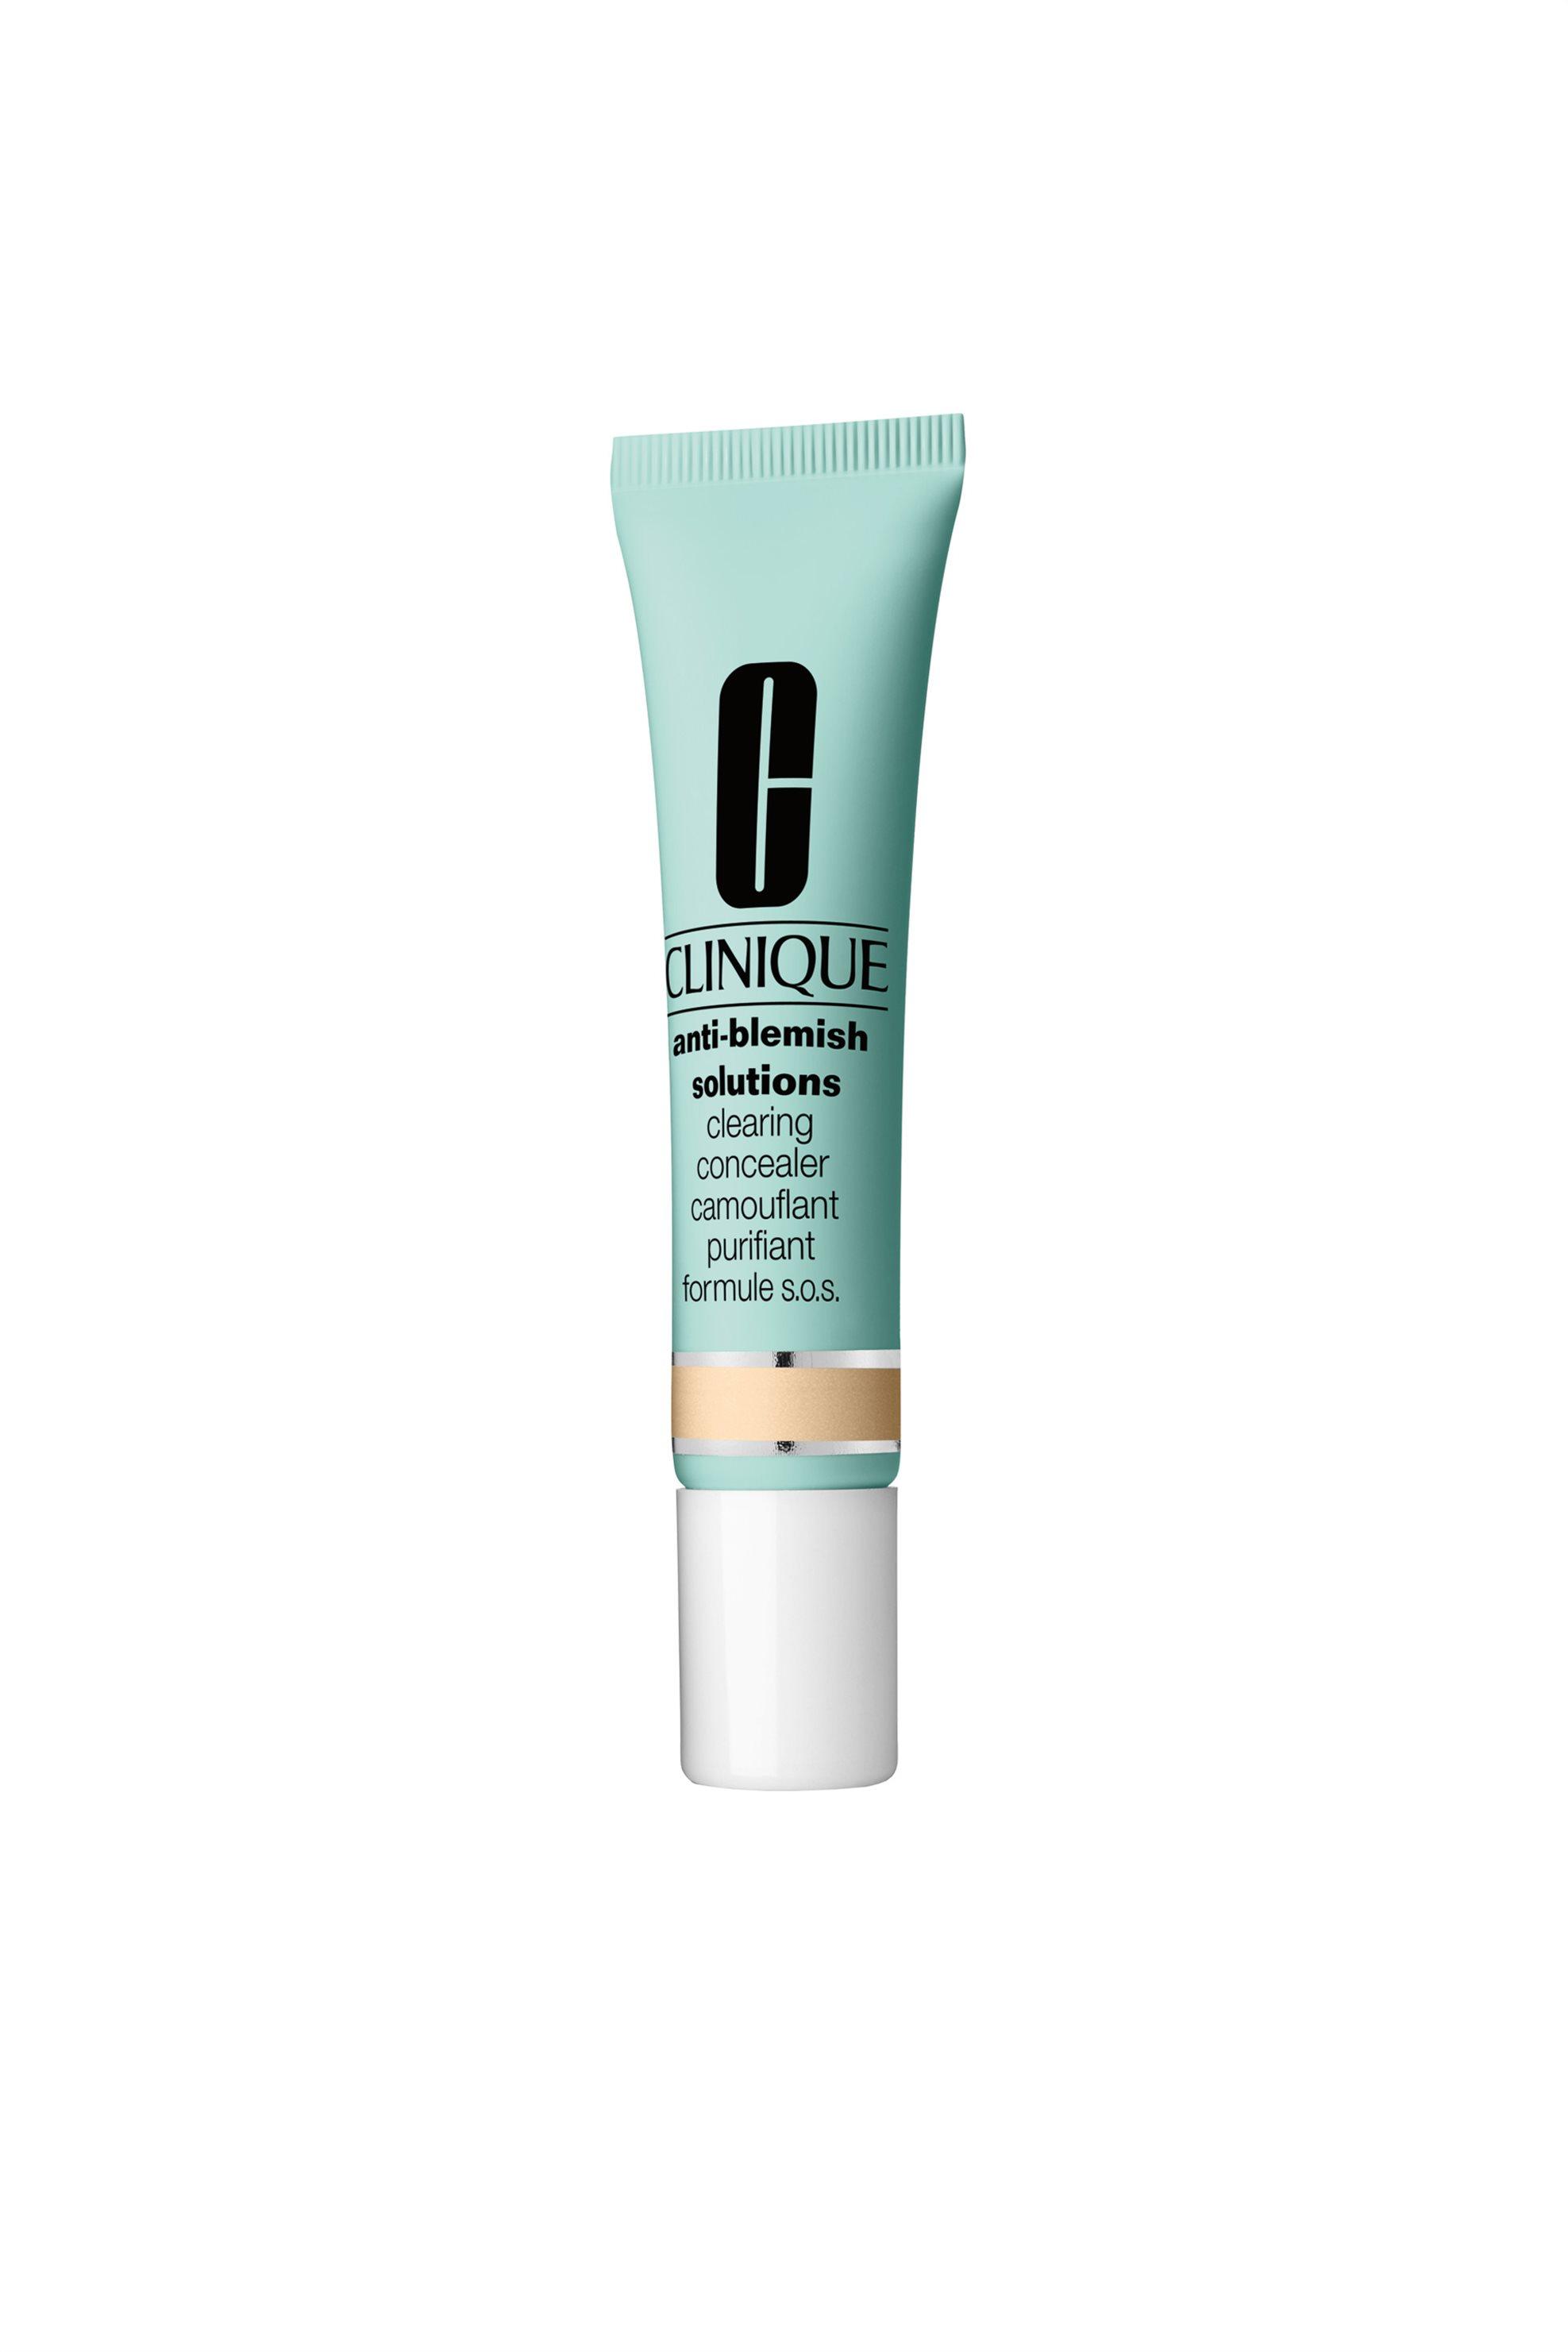 Clinique Anti-Blemish Solutions™ Clearing Concealer Shade 02 10 ml - 6N4T020000 ομορφια   καλλυντικα επιλεκτικησ   μακιγιάζ   πρόσωπο   concealers